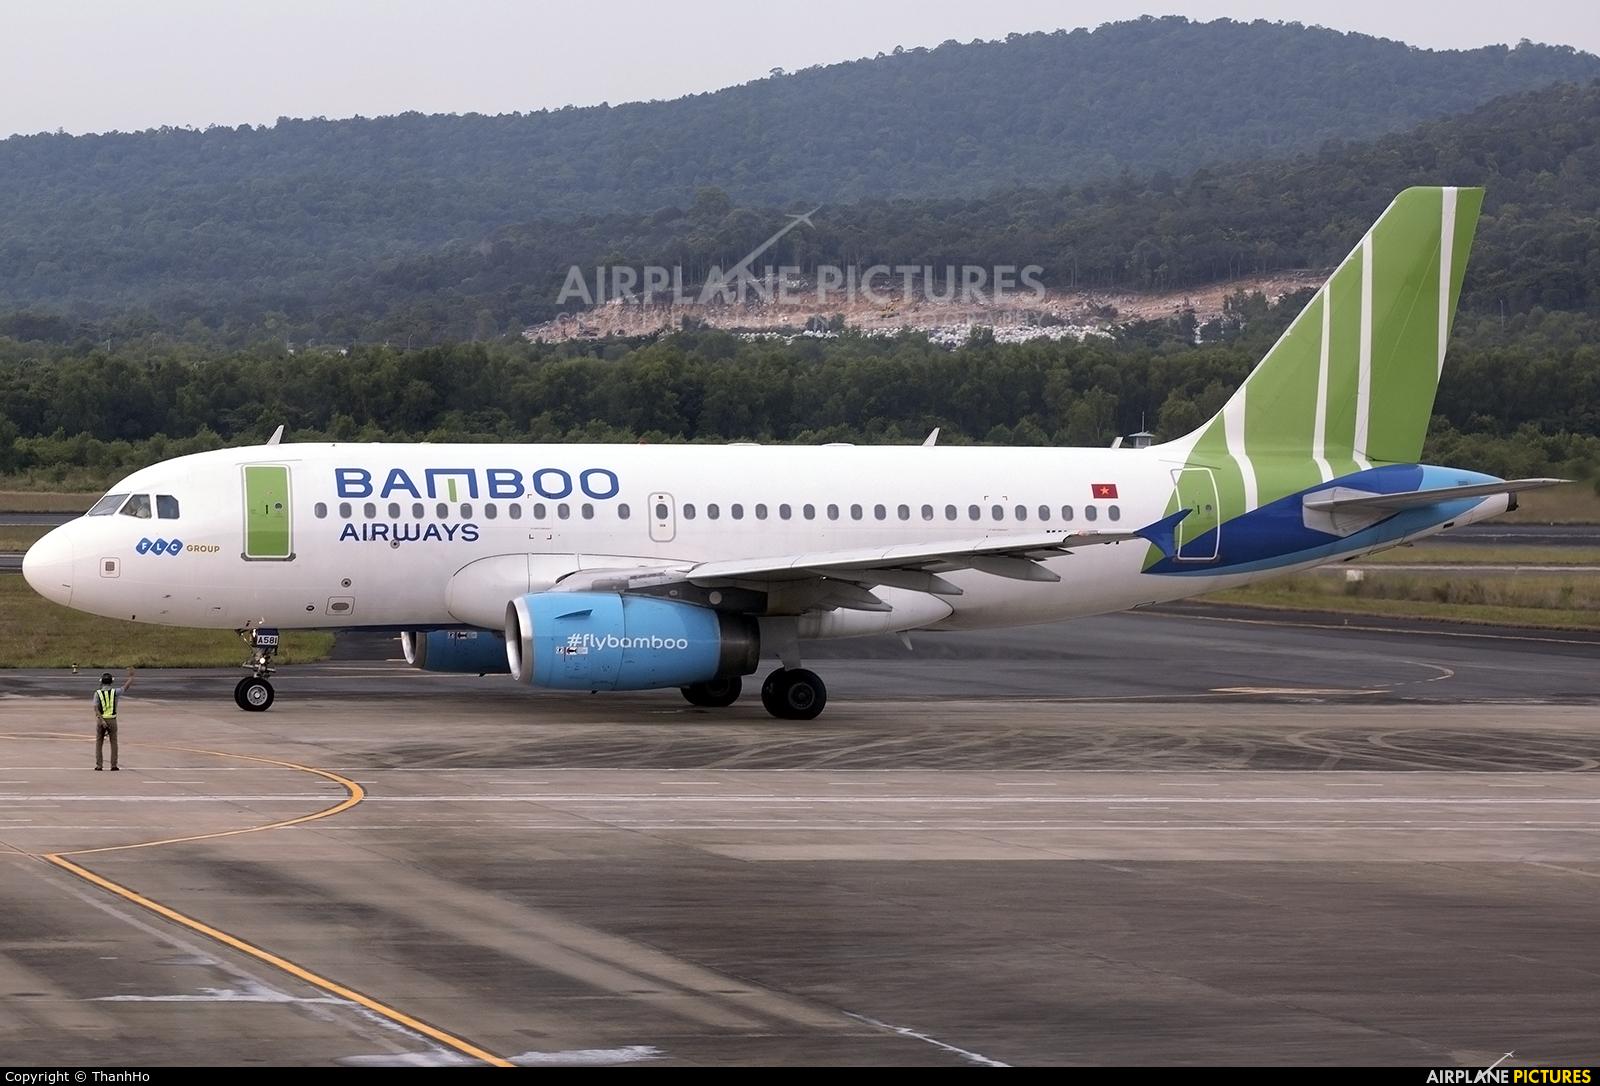 Bamboo Airways VN-A581 aircraft at Phu Quoc